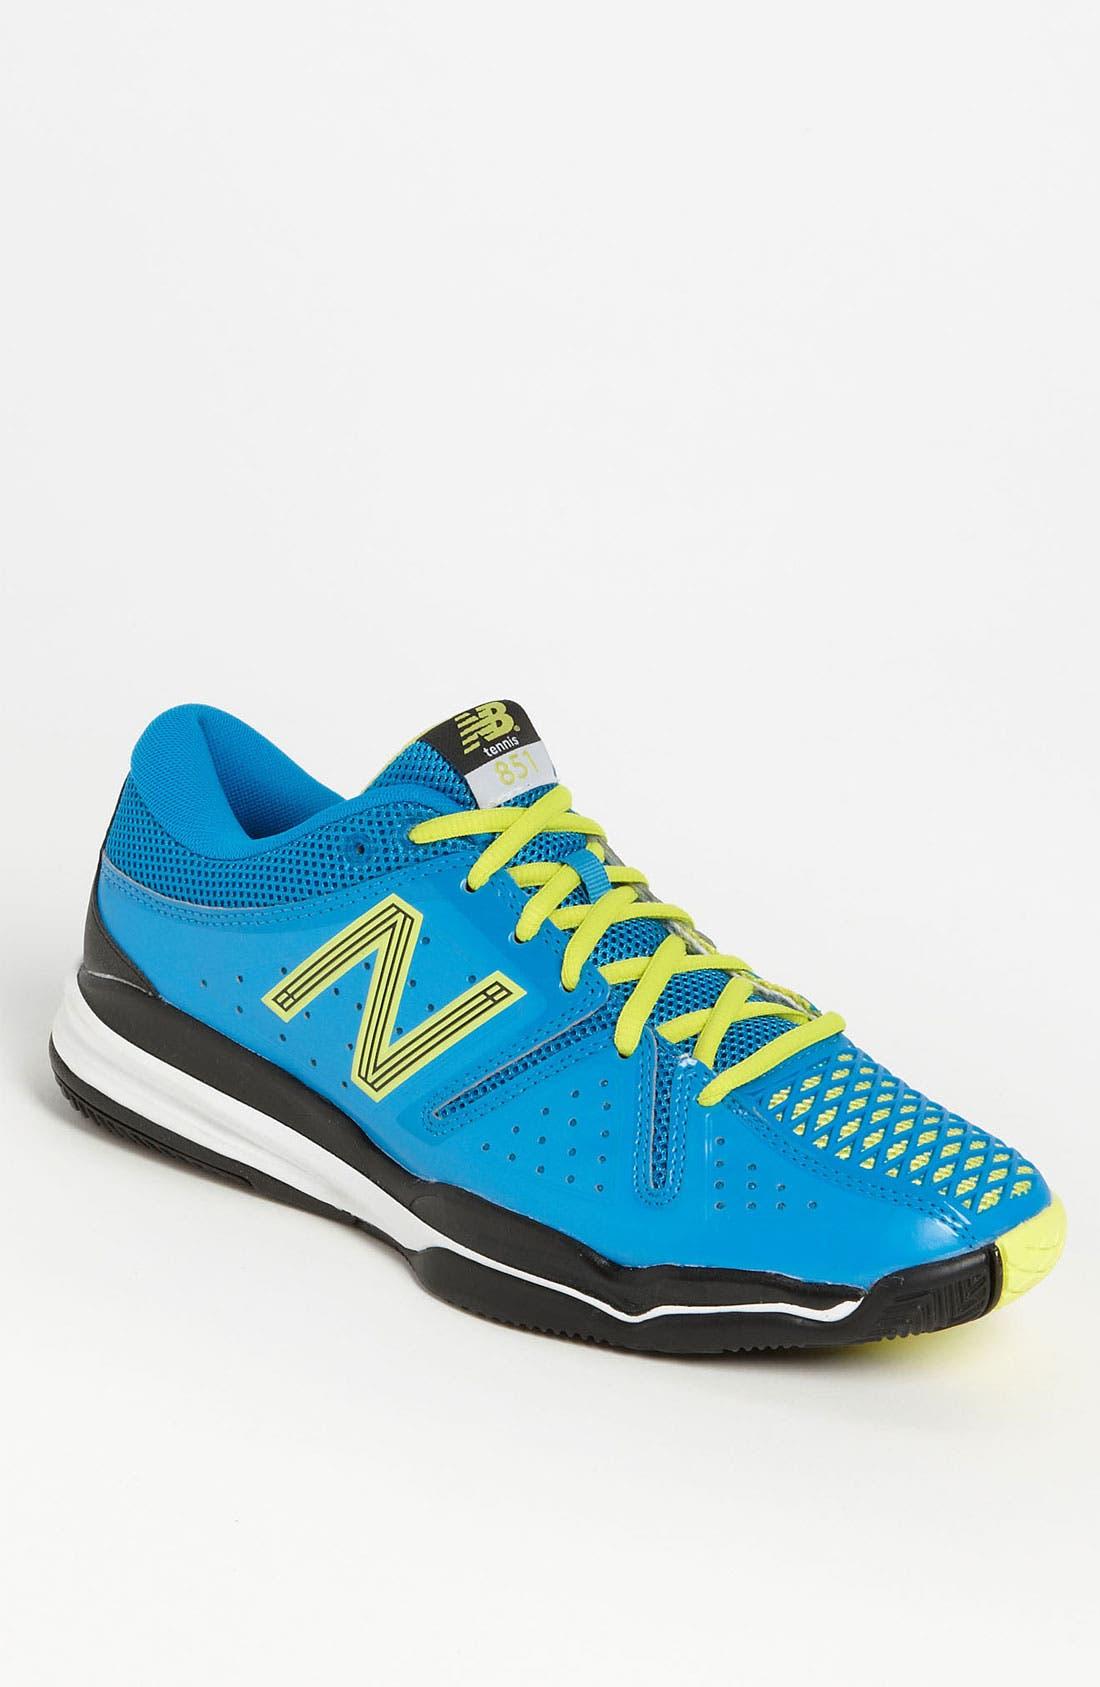 Alternate Image 1 Selected - New Balance '851' Tennis Shoe (Men)